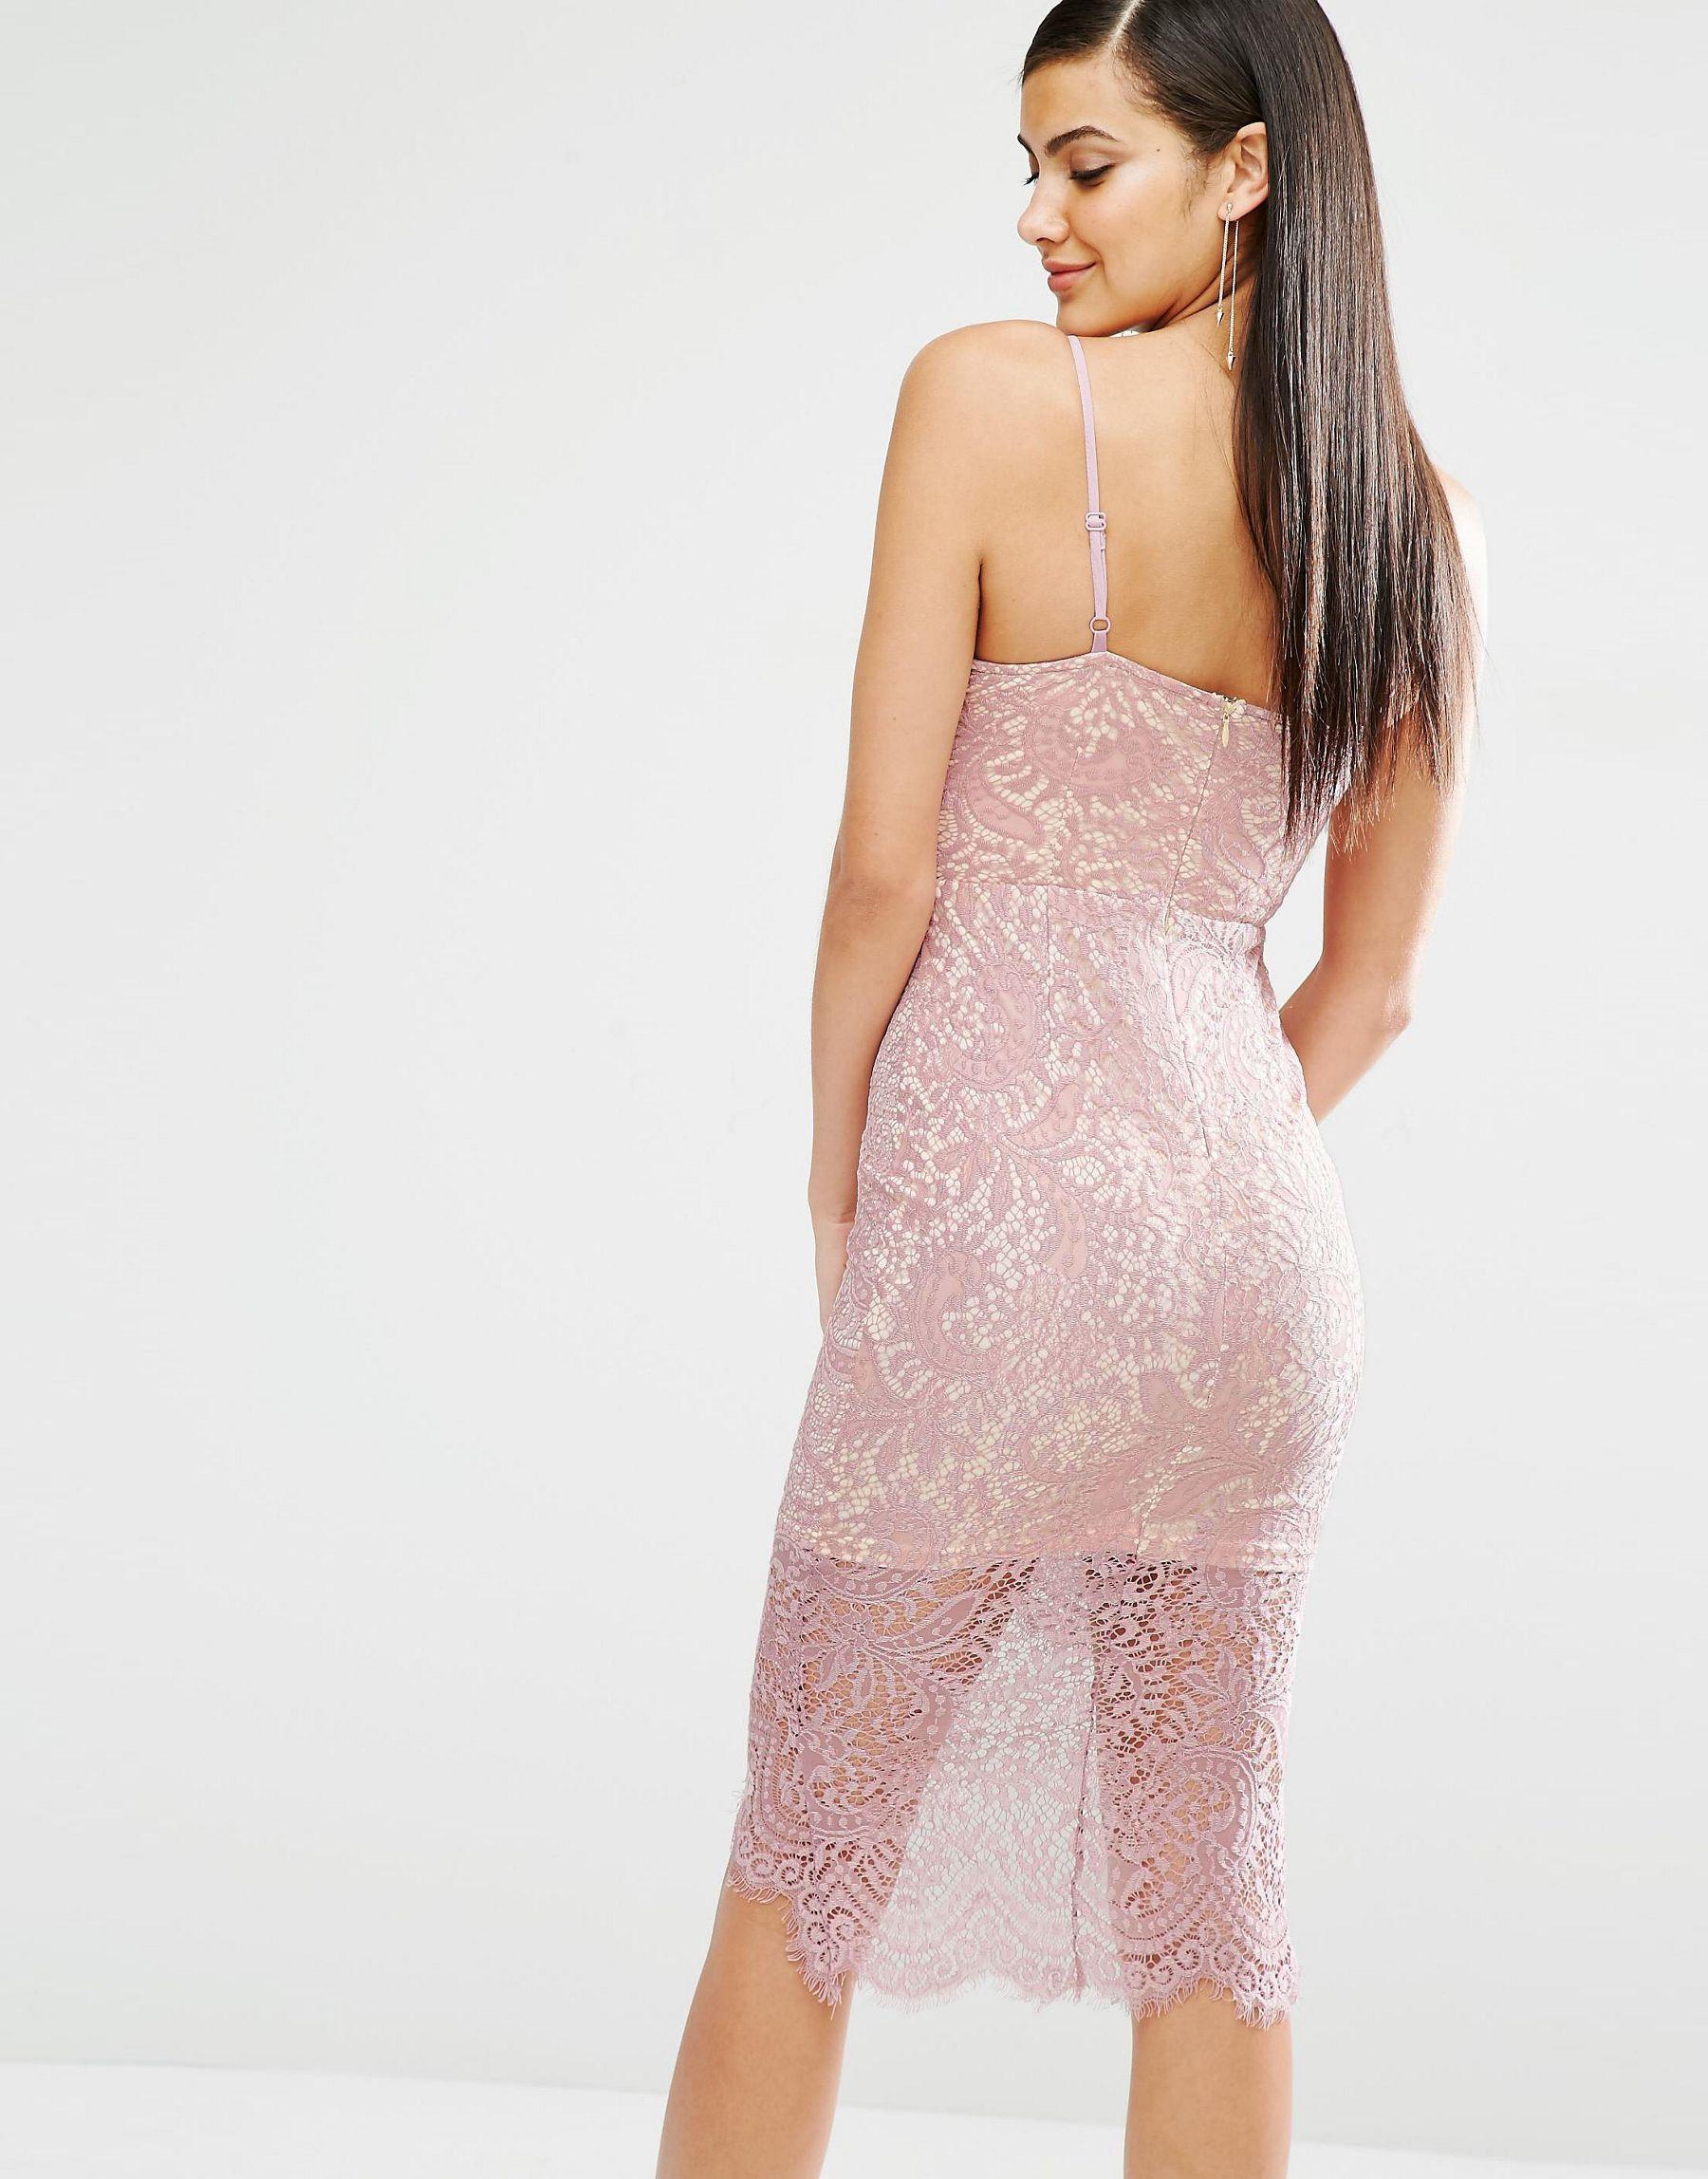 Adrianna papell sequin bodycon dress quartz mall turkey